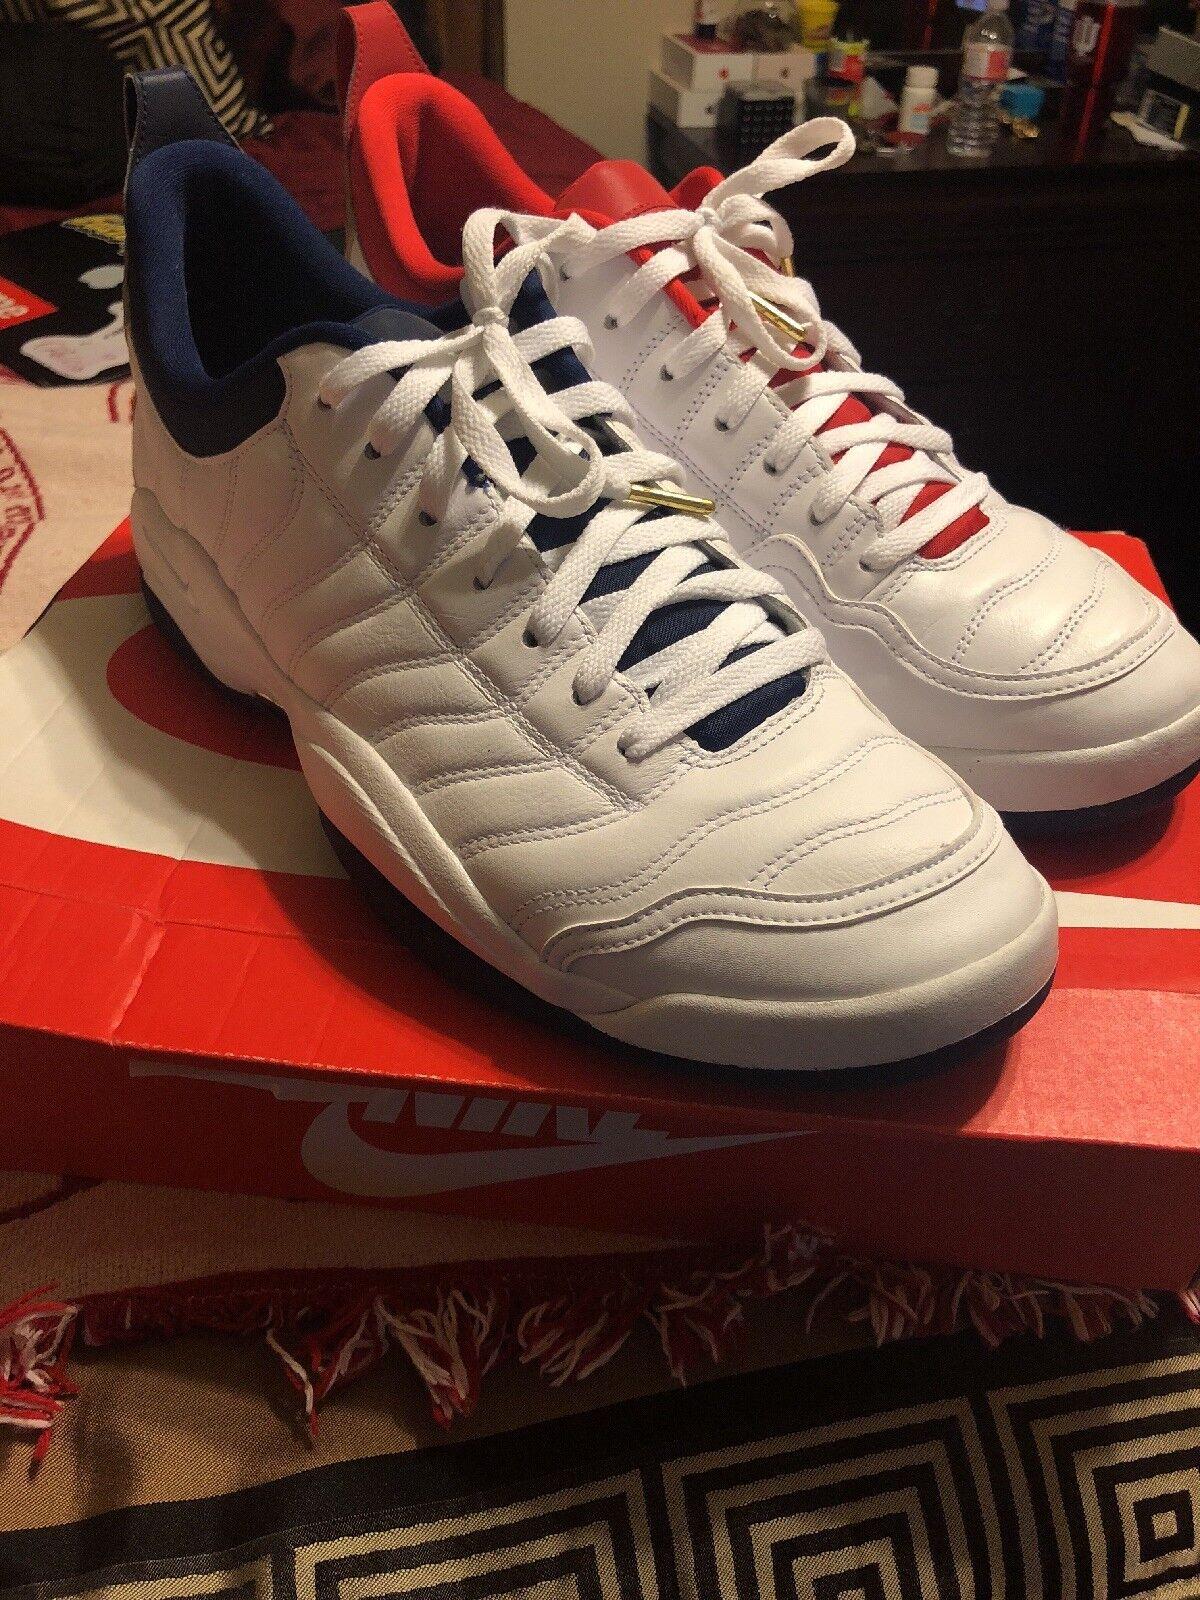 Nike Air Oscillate Size 15